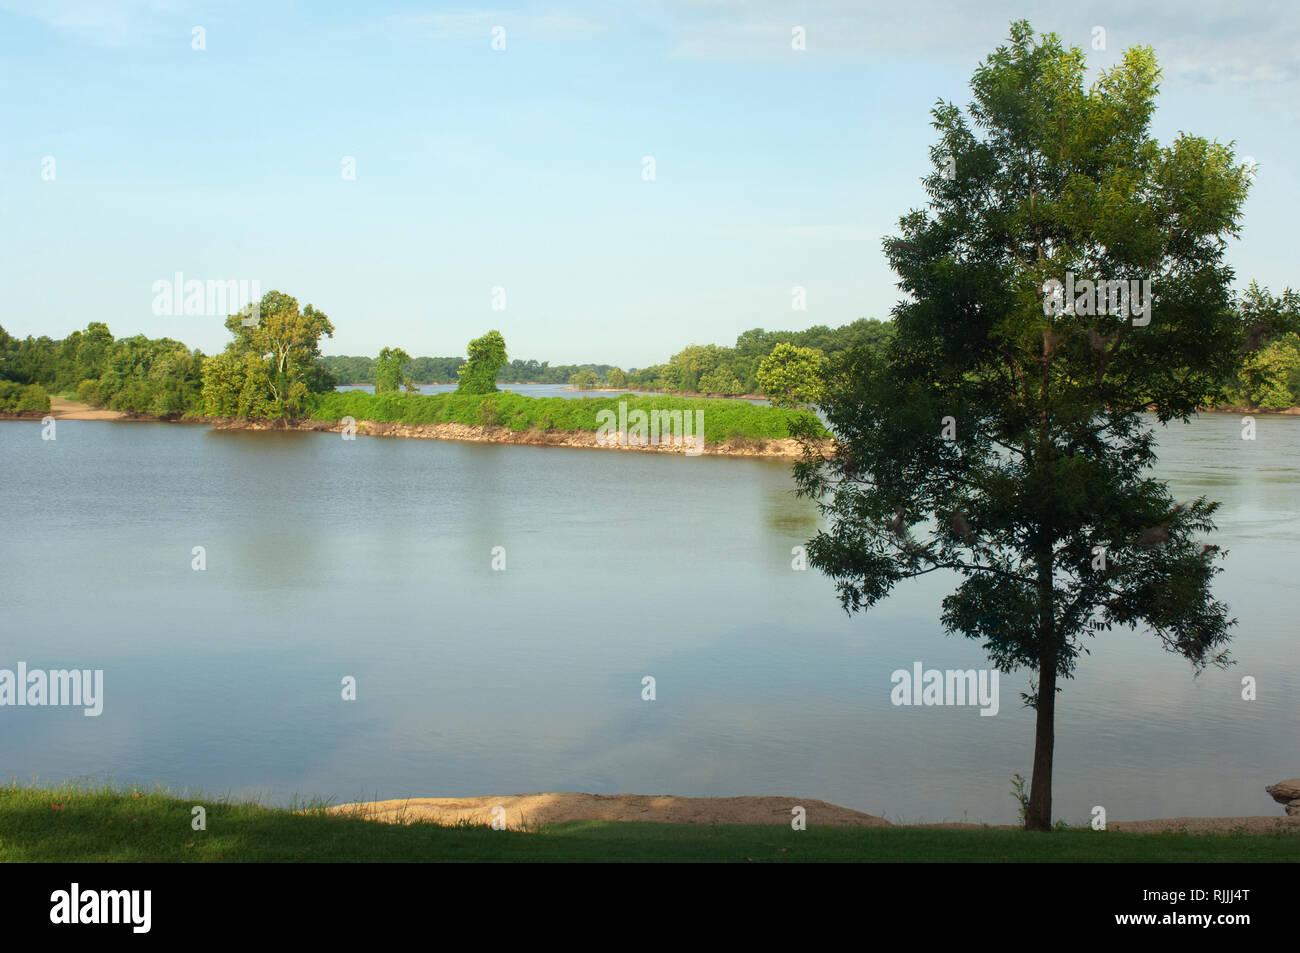 Arkansas River, looking at Oklahoma shore from Fort Smith National Historic Site, Arkansas. Digital photograph Stock Photo